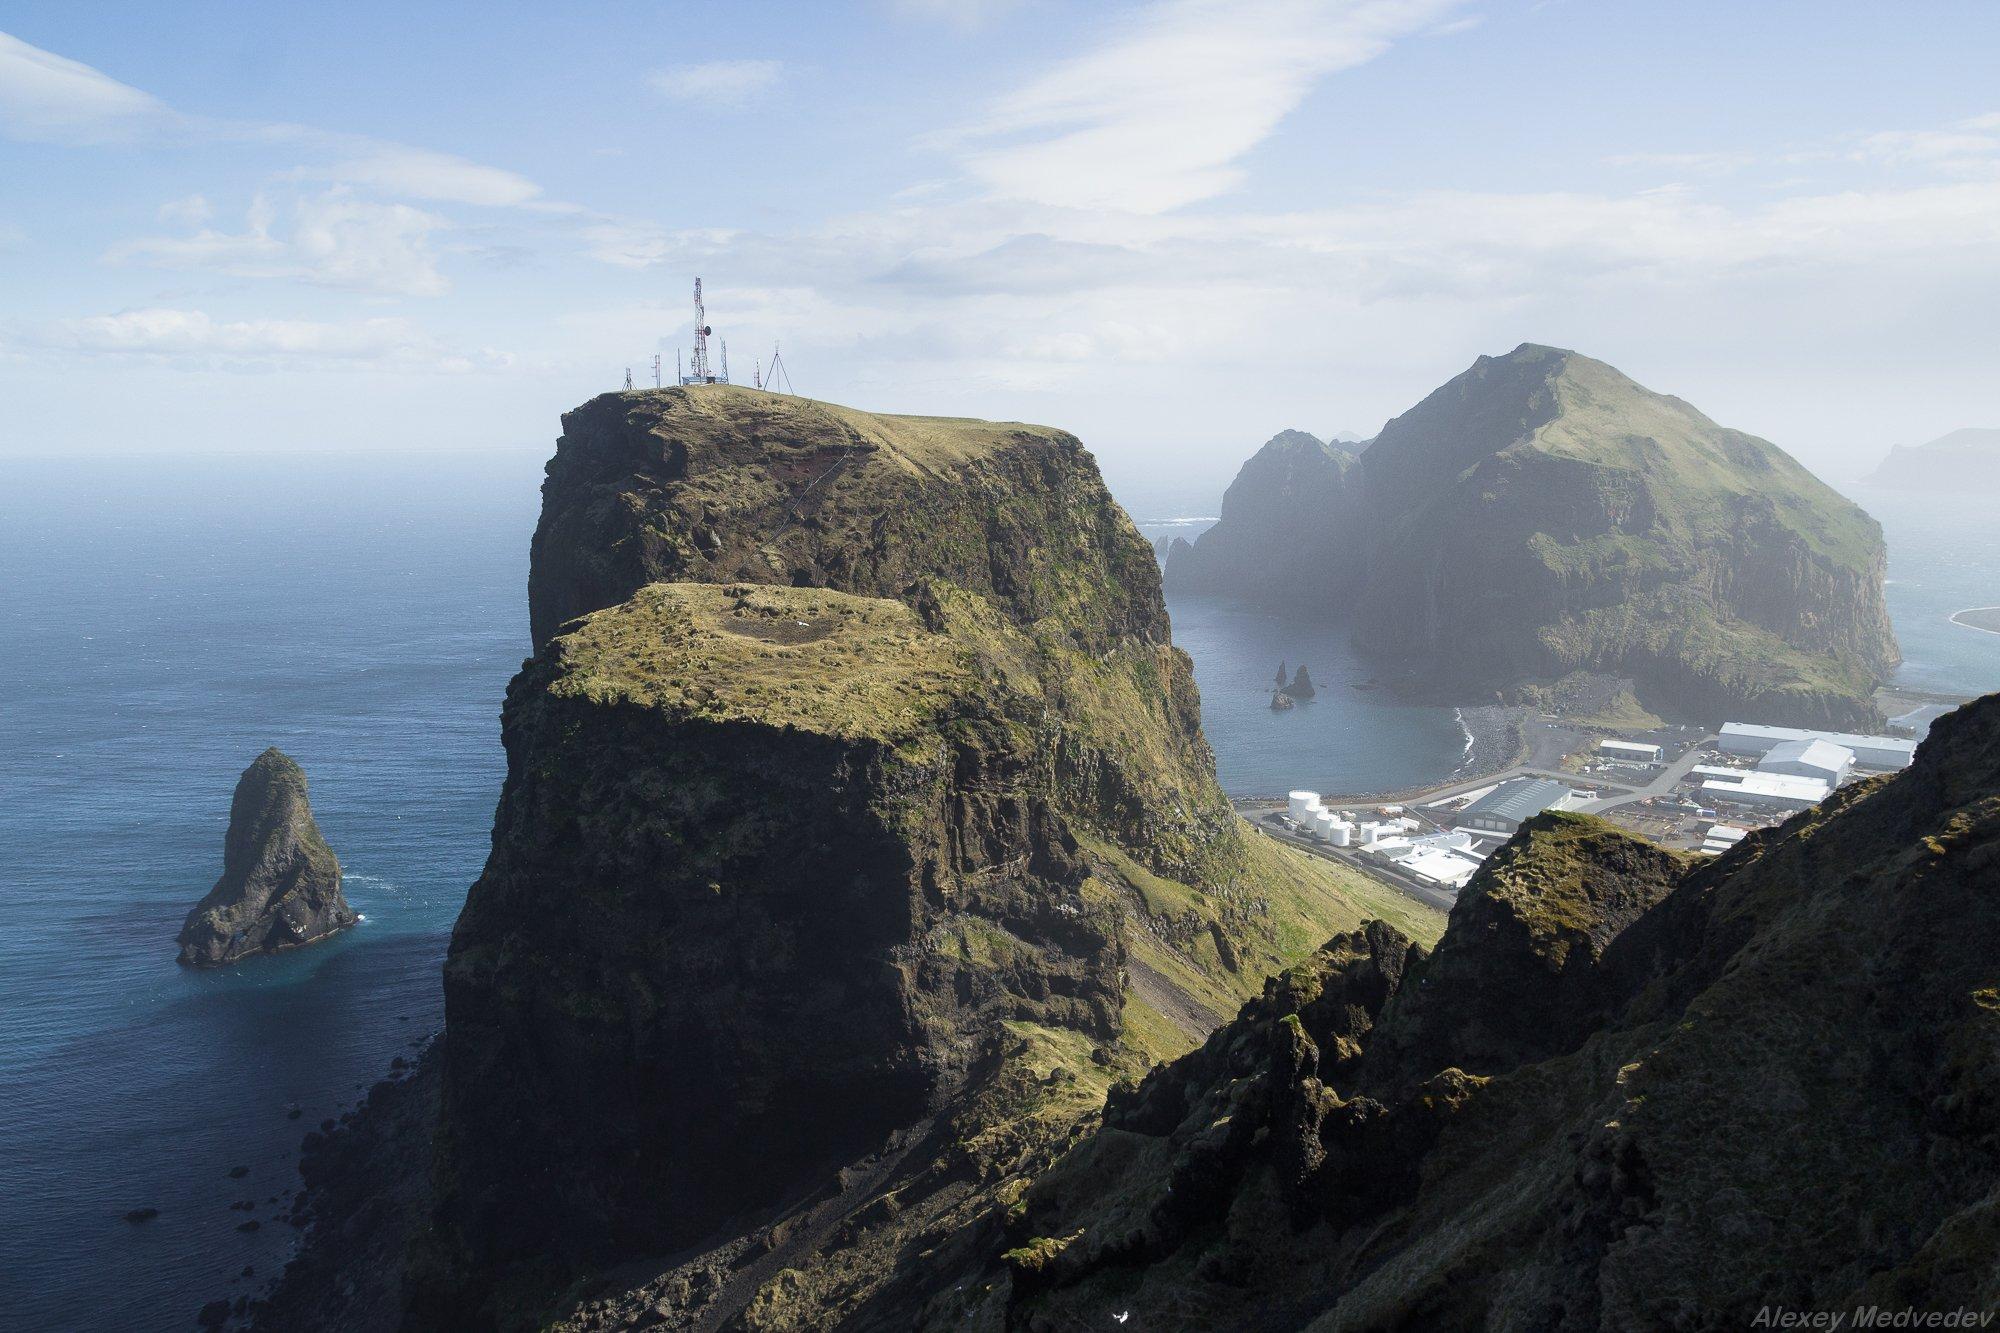 Исландия, Архипелаг, Вестманнаэйар, Iceland, Archipelago, Vestmannaeyjar, Heimaey, island, rocks, sea, остров, скалы, море, океан, Алексей Медведев